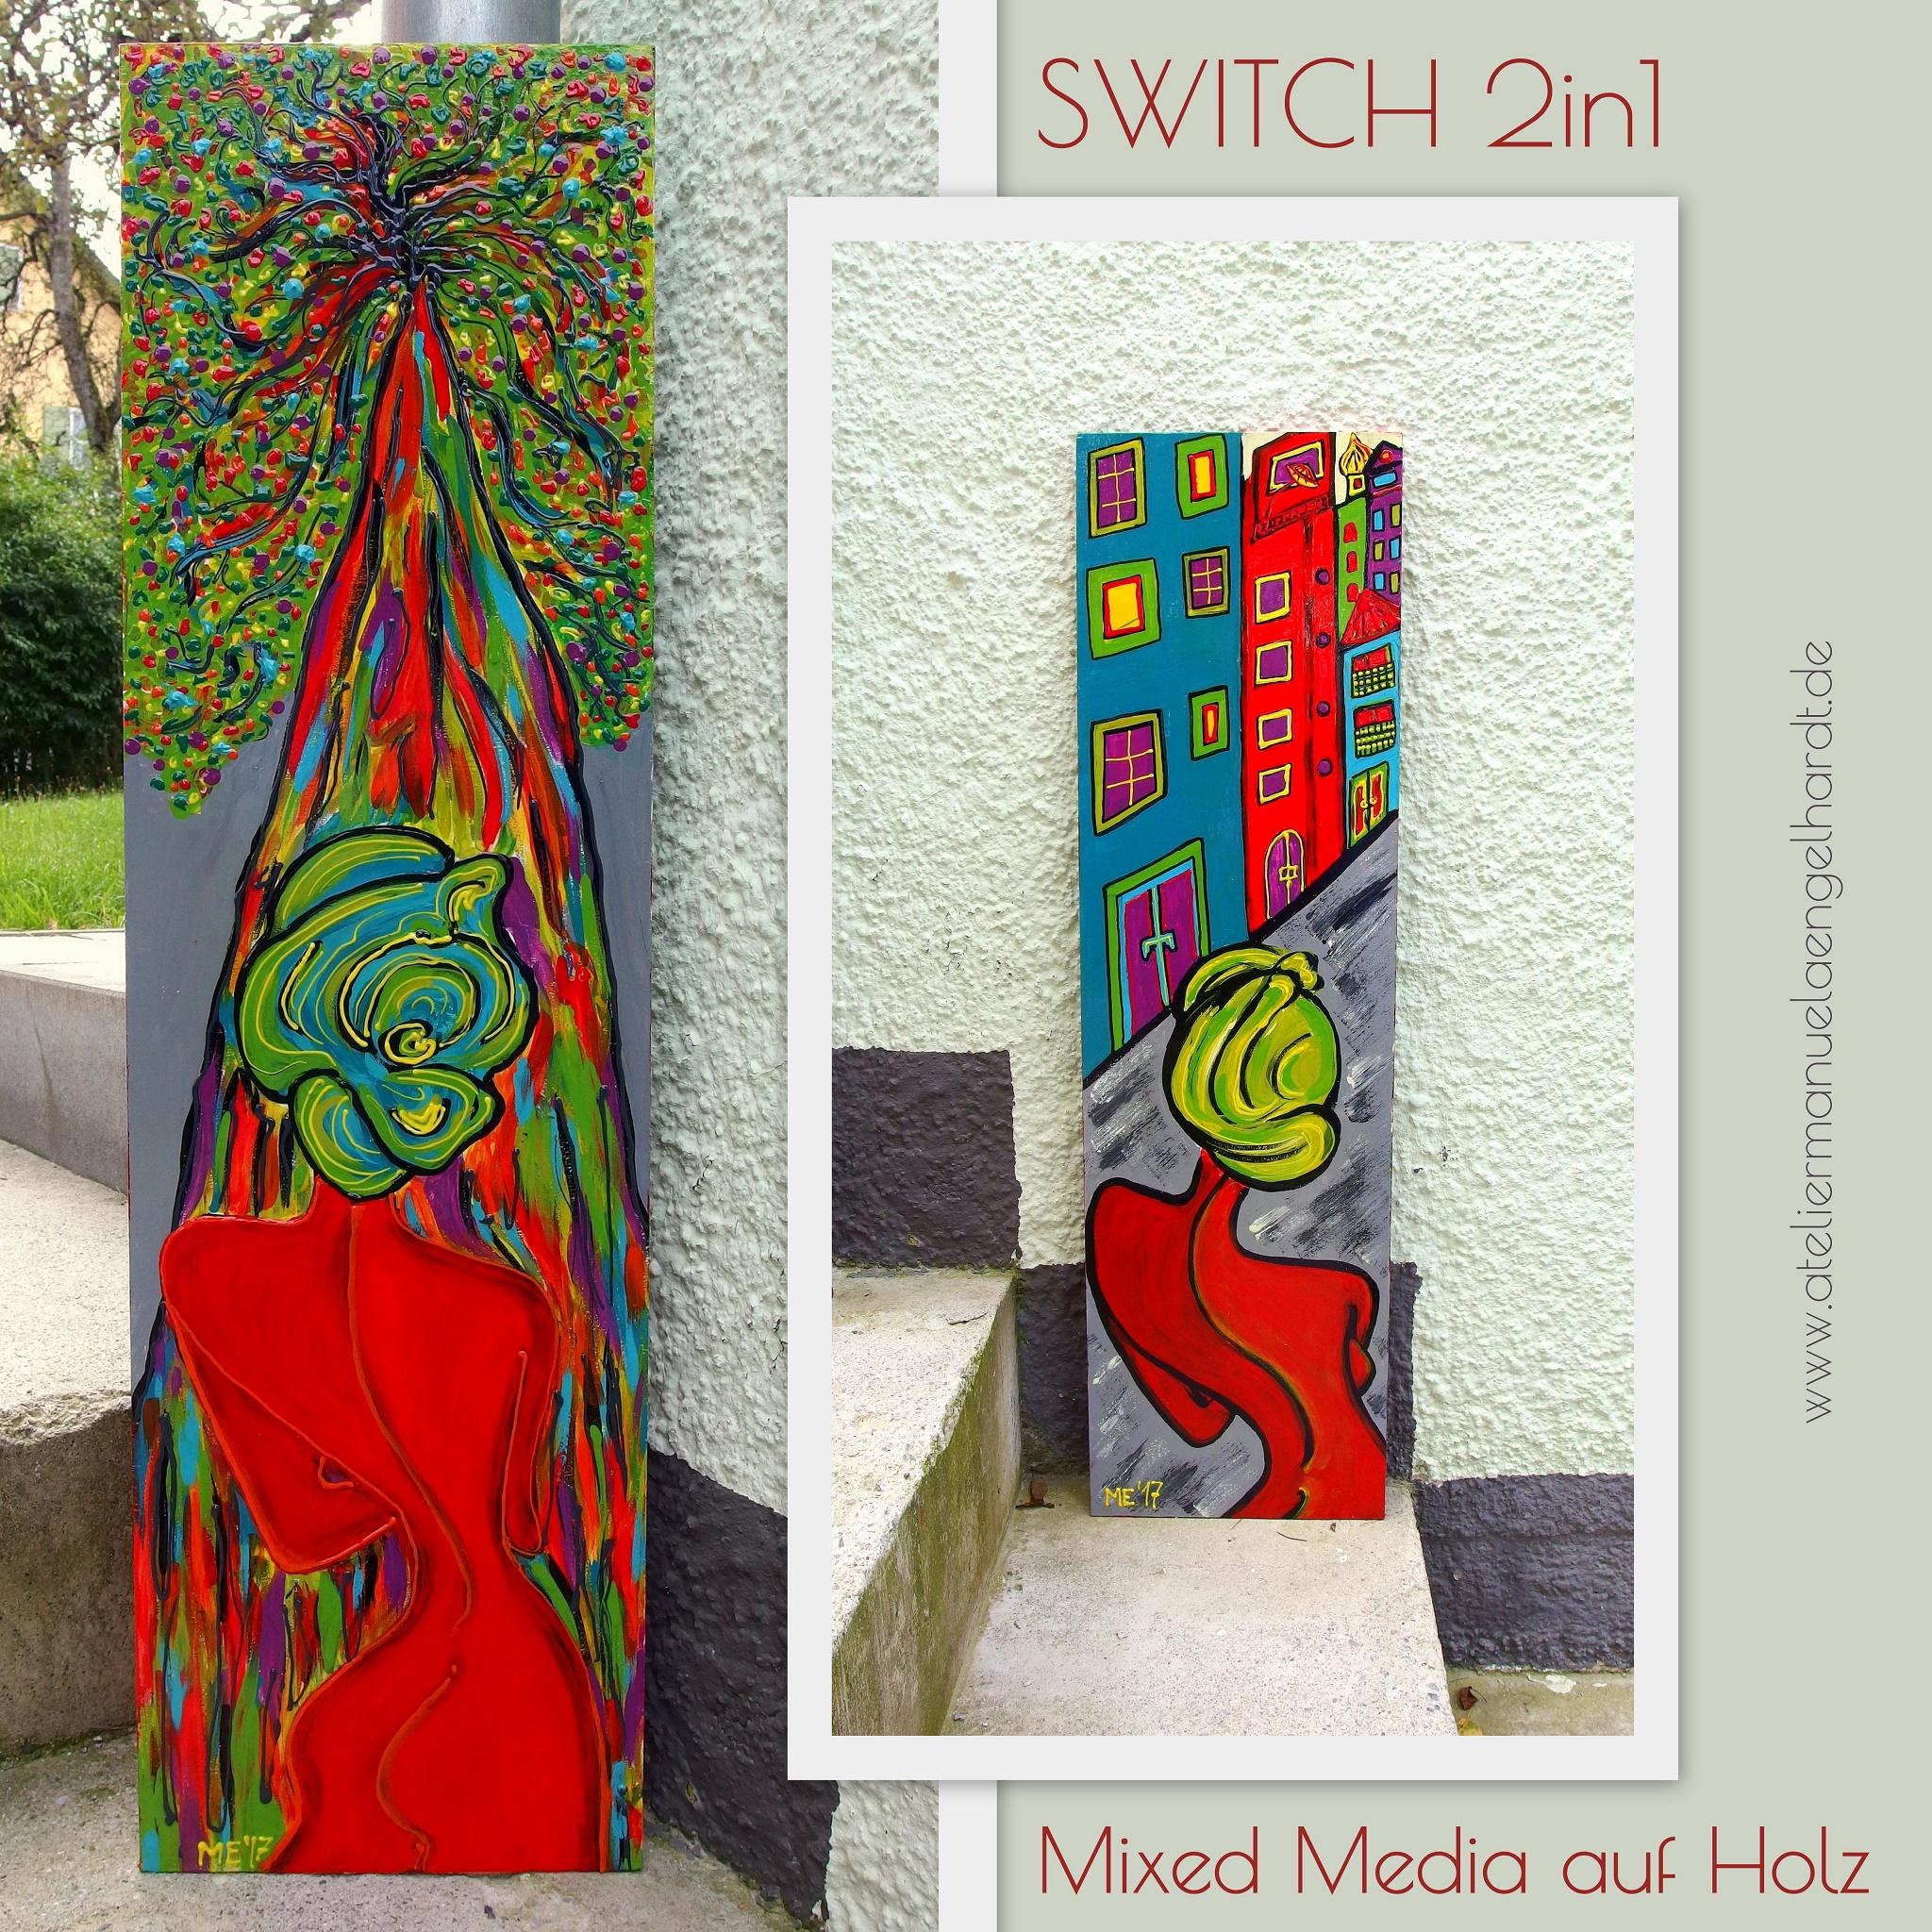 Switchbild, Mixed Media auf Holz